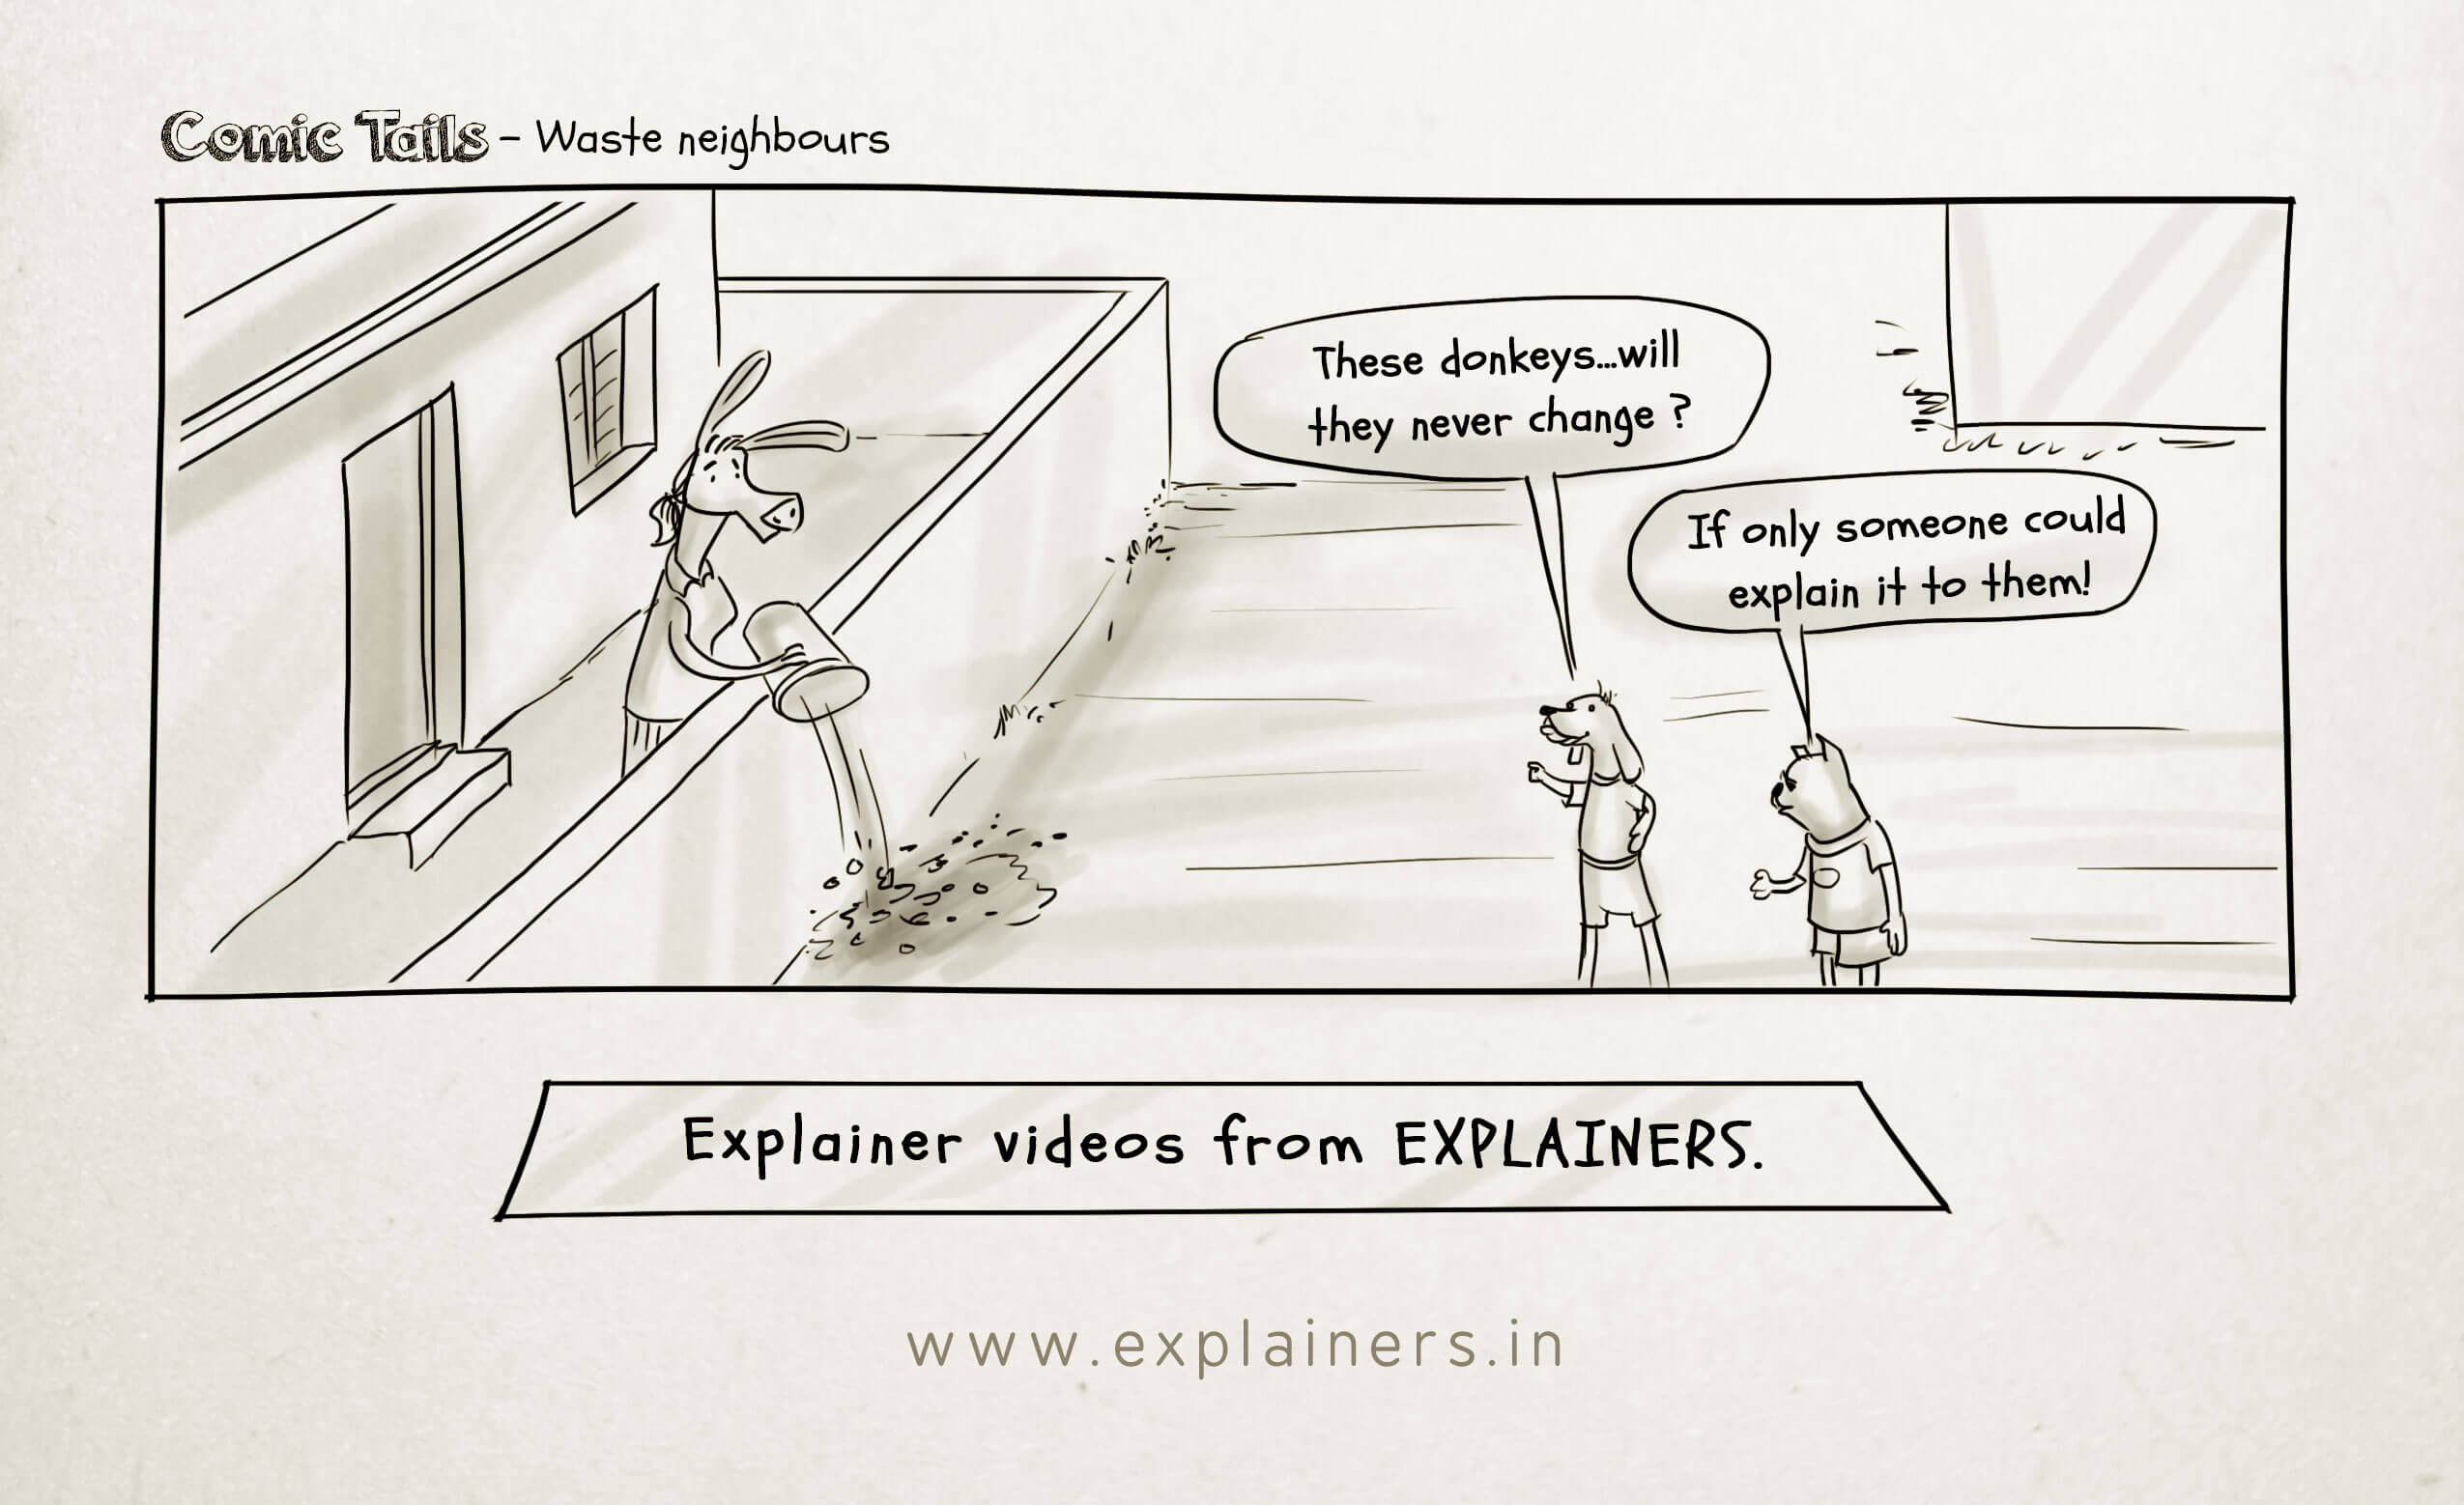 Comic Tails, comic, Explainers video, explainers, animated explainer video, animation video, animation production company, explainer video production company, explainer video company in india